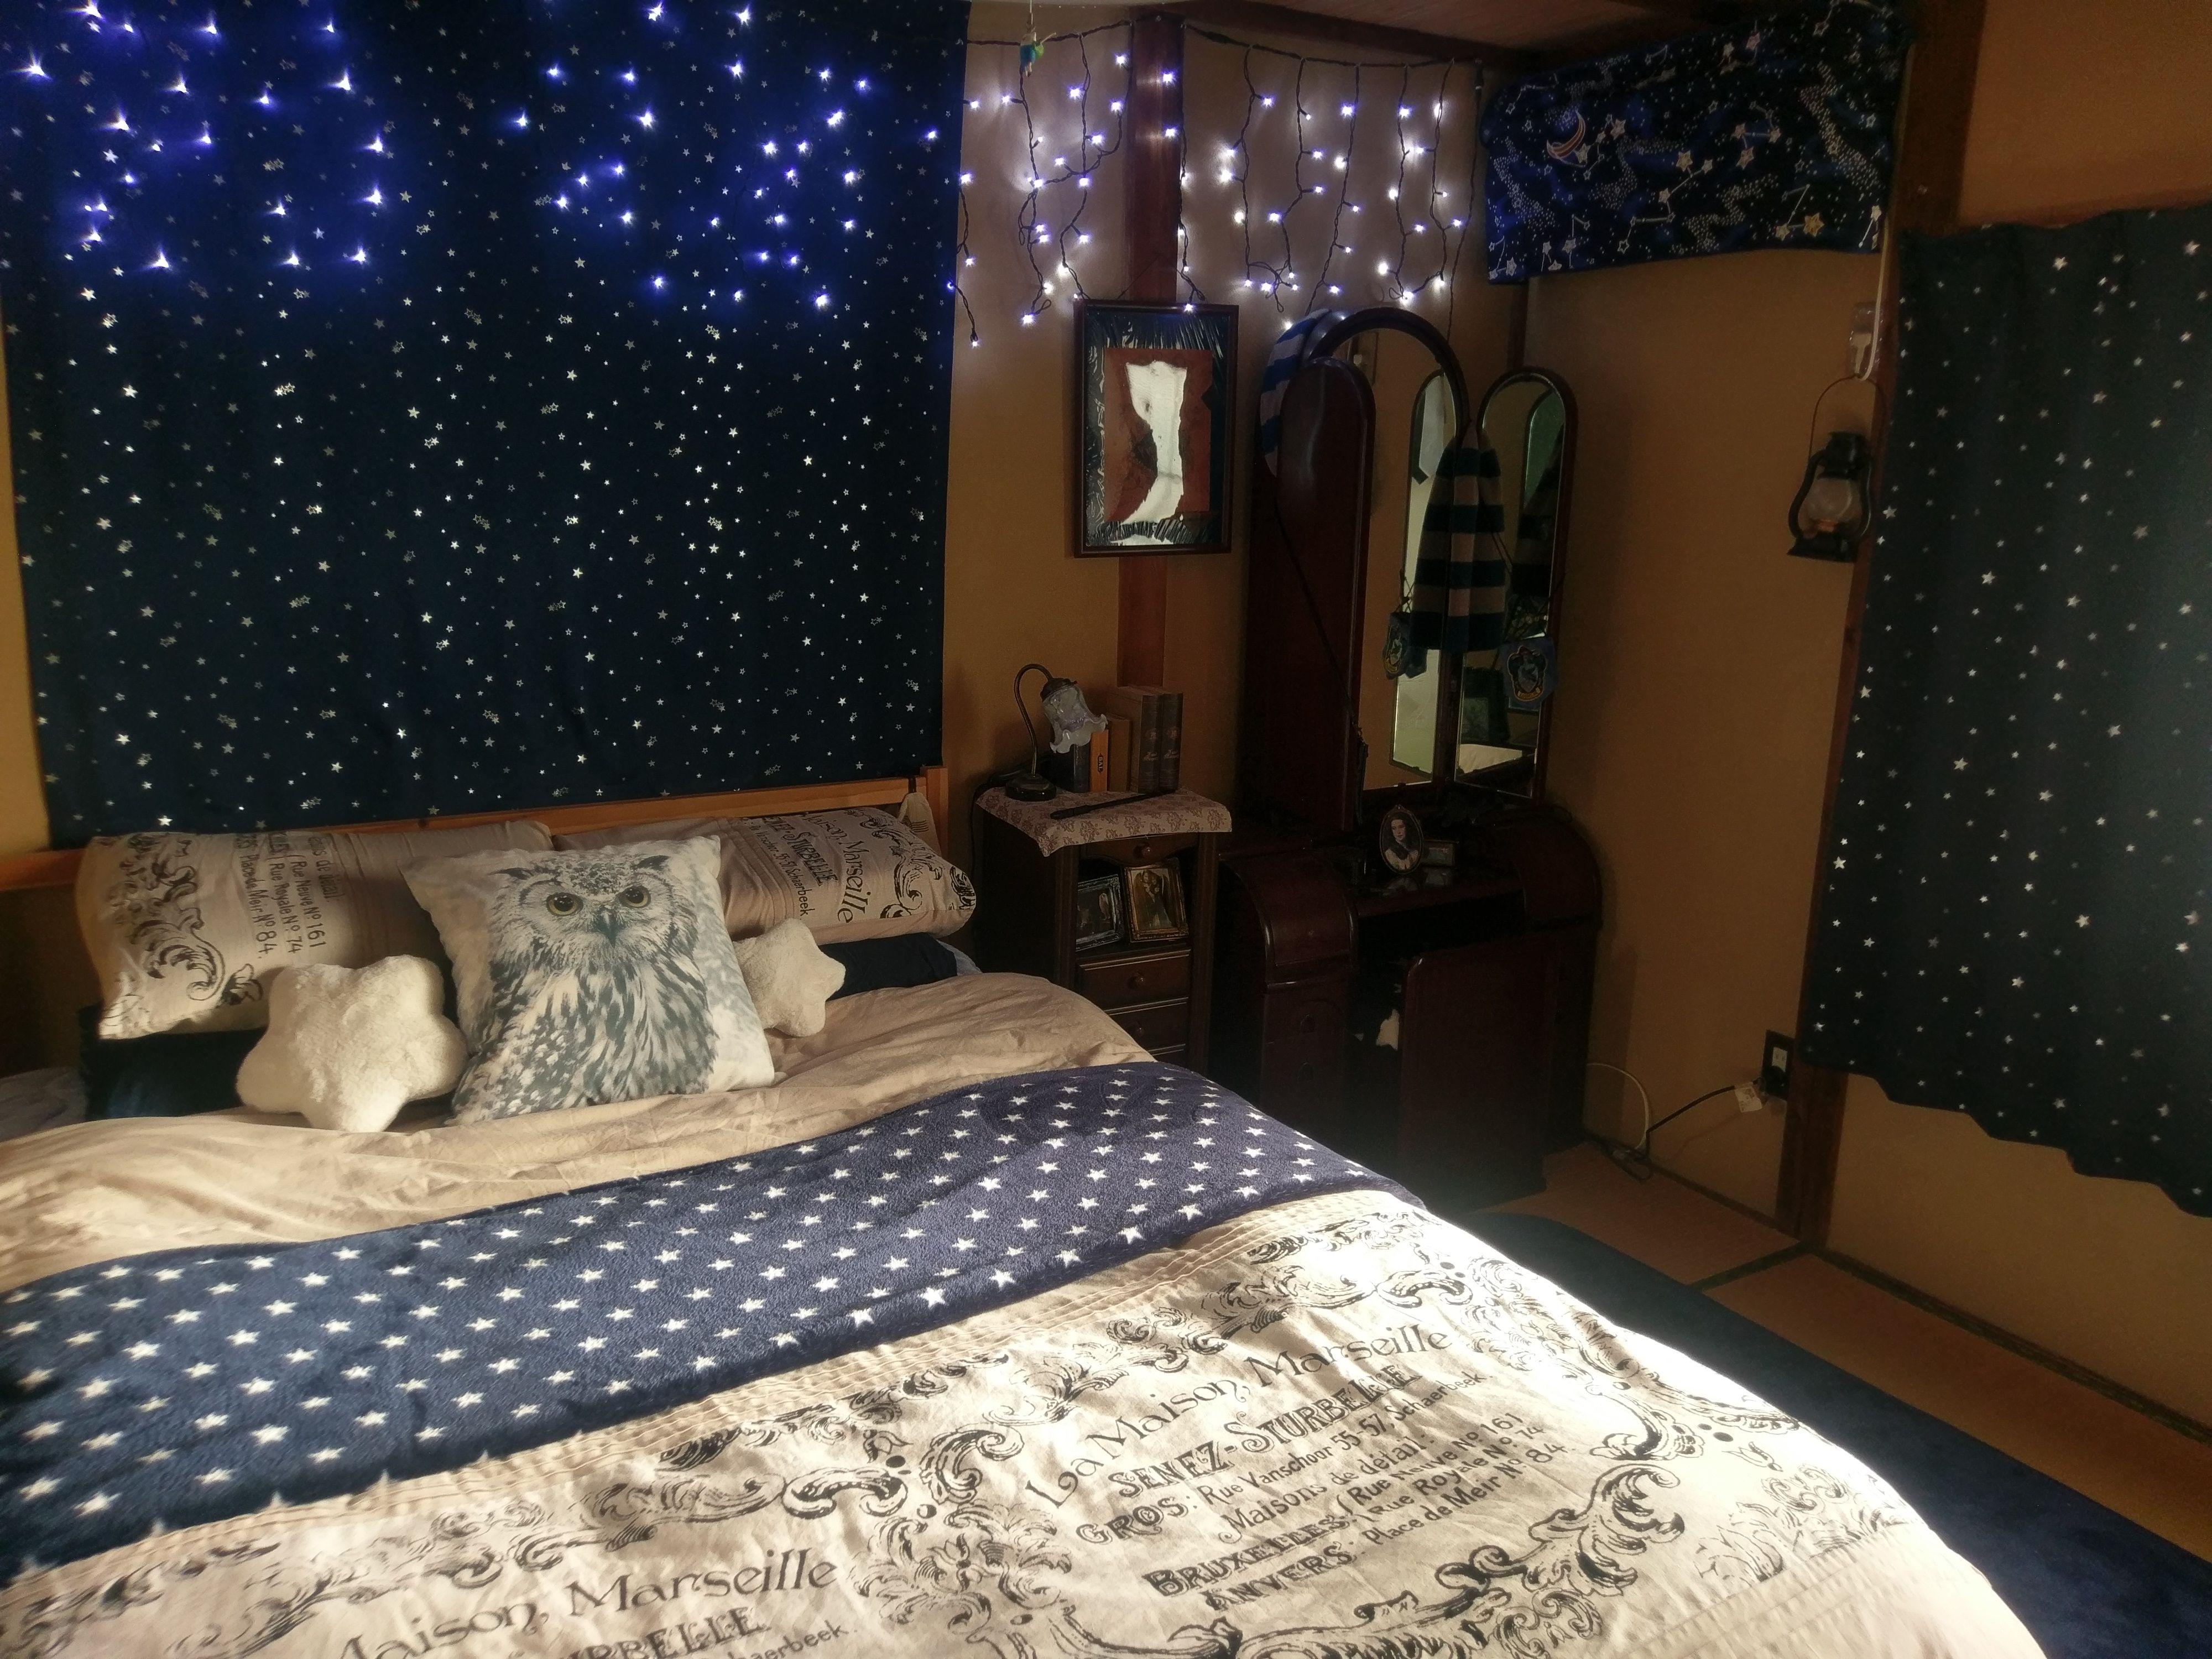 My Ravenclaw Bedroom Plenty Of Stars Against Dark Blue Backgrounds Aesthetic Bedroom Redecorate Bedroom Hogwarts Bedroom